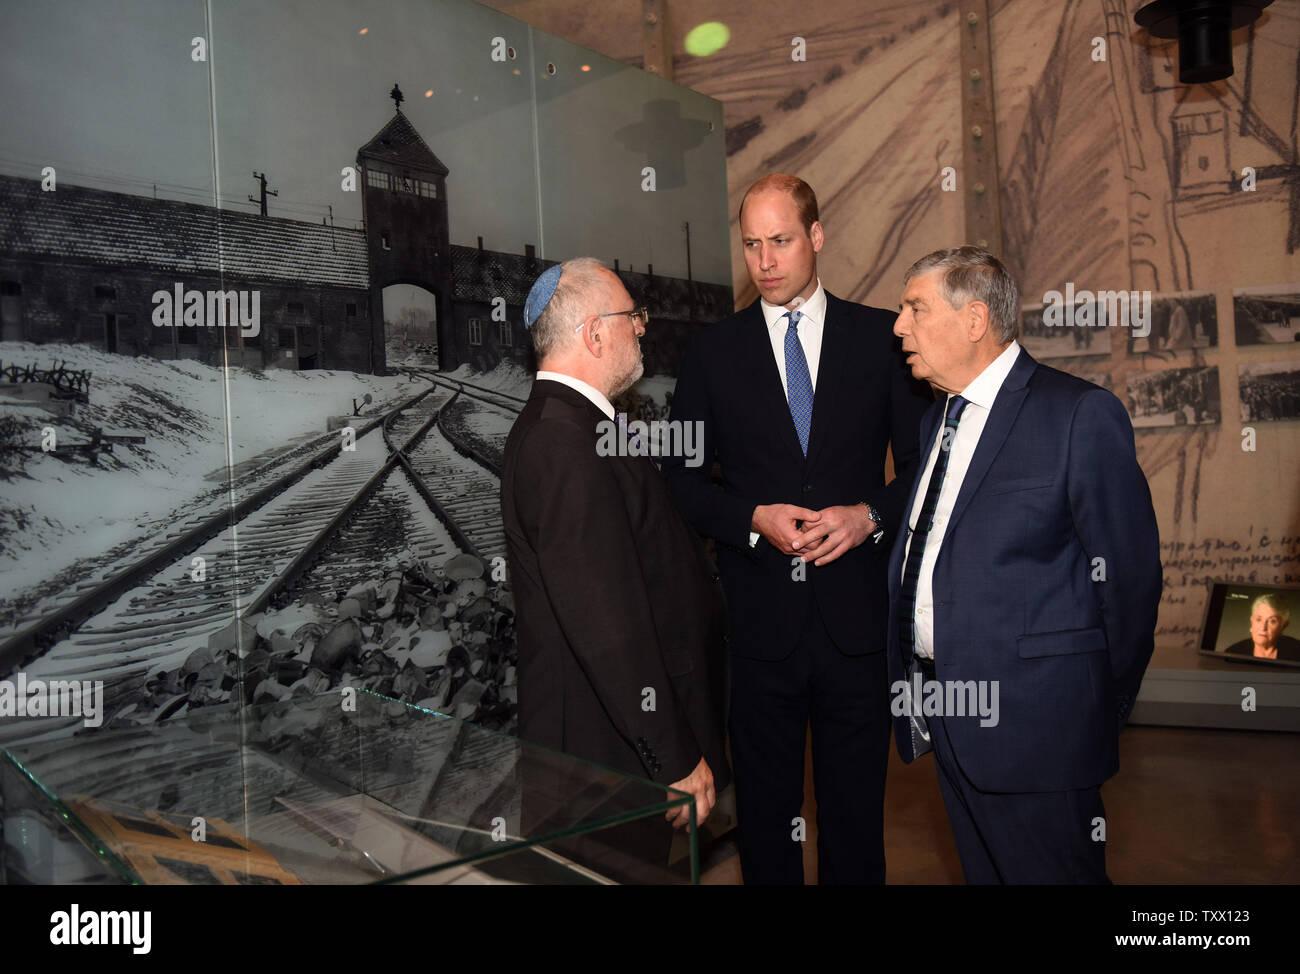 Prince William, the Duke of Cambridge, visits Yad Vashem, the World Holocaust Remembrance Center, in Jerusalem, Israel, June 26, 2018.  Photo by Debbie Hill/UPI - Stock Image